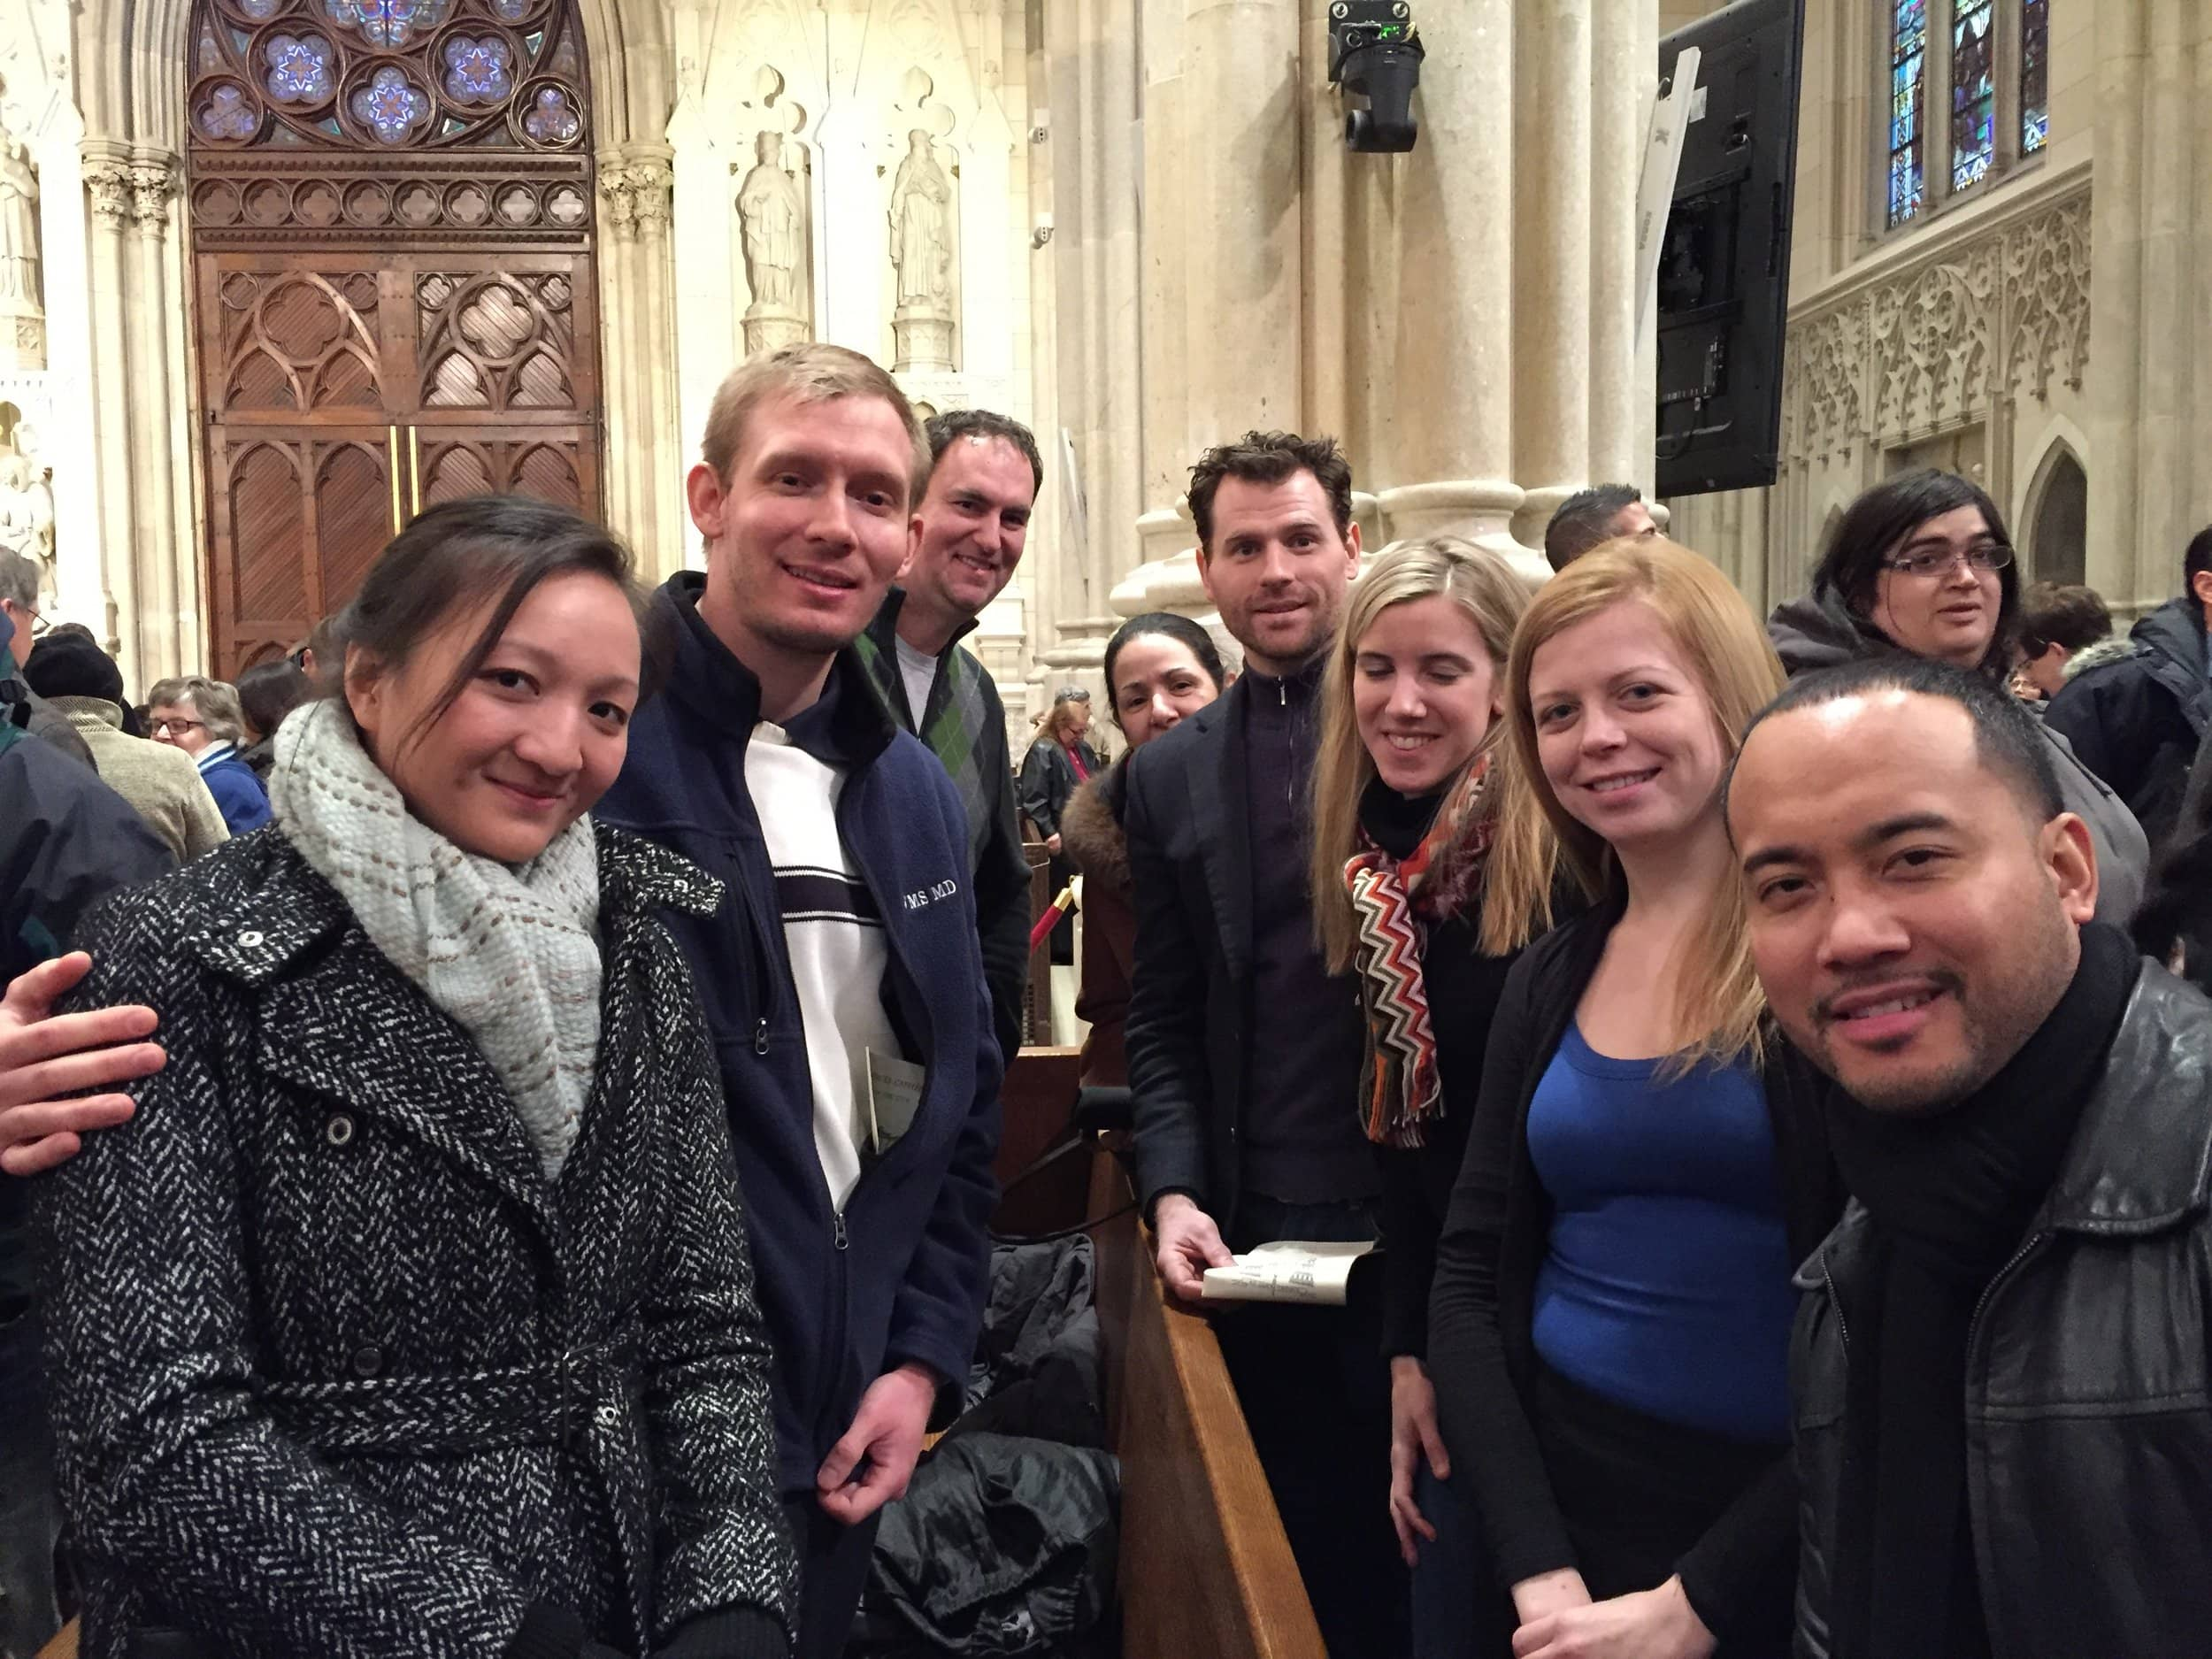 adult-sacrament-rcia-st-francis-de-sales-church-new-york-city.jpg